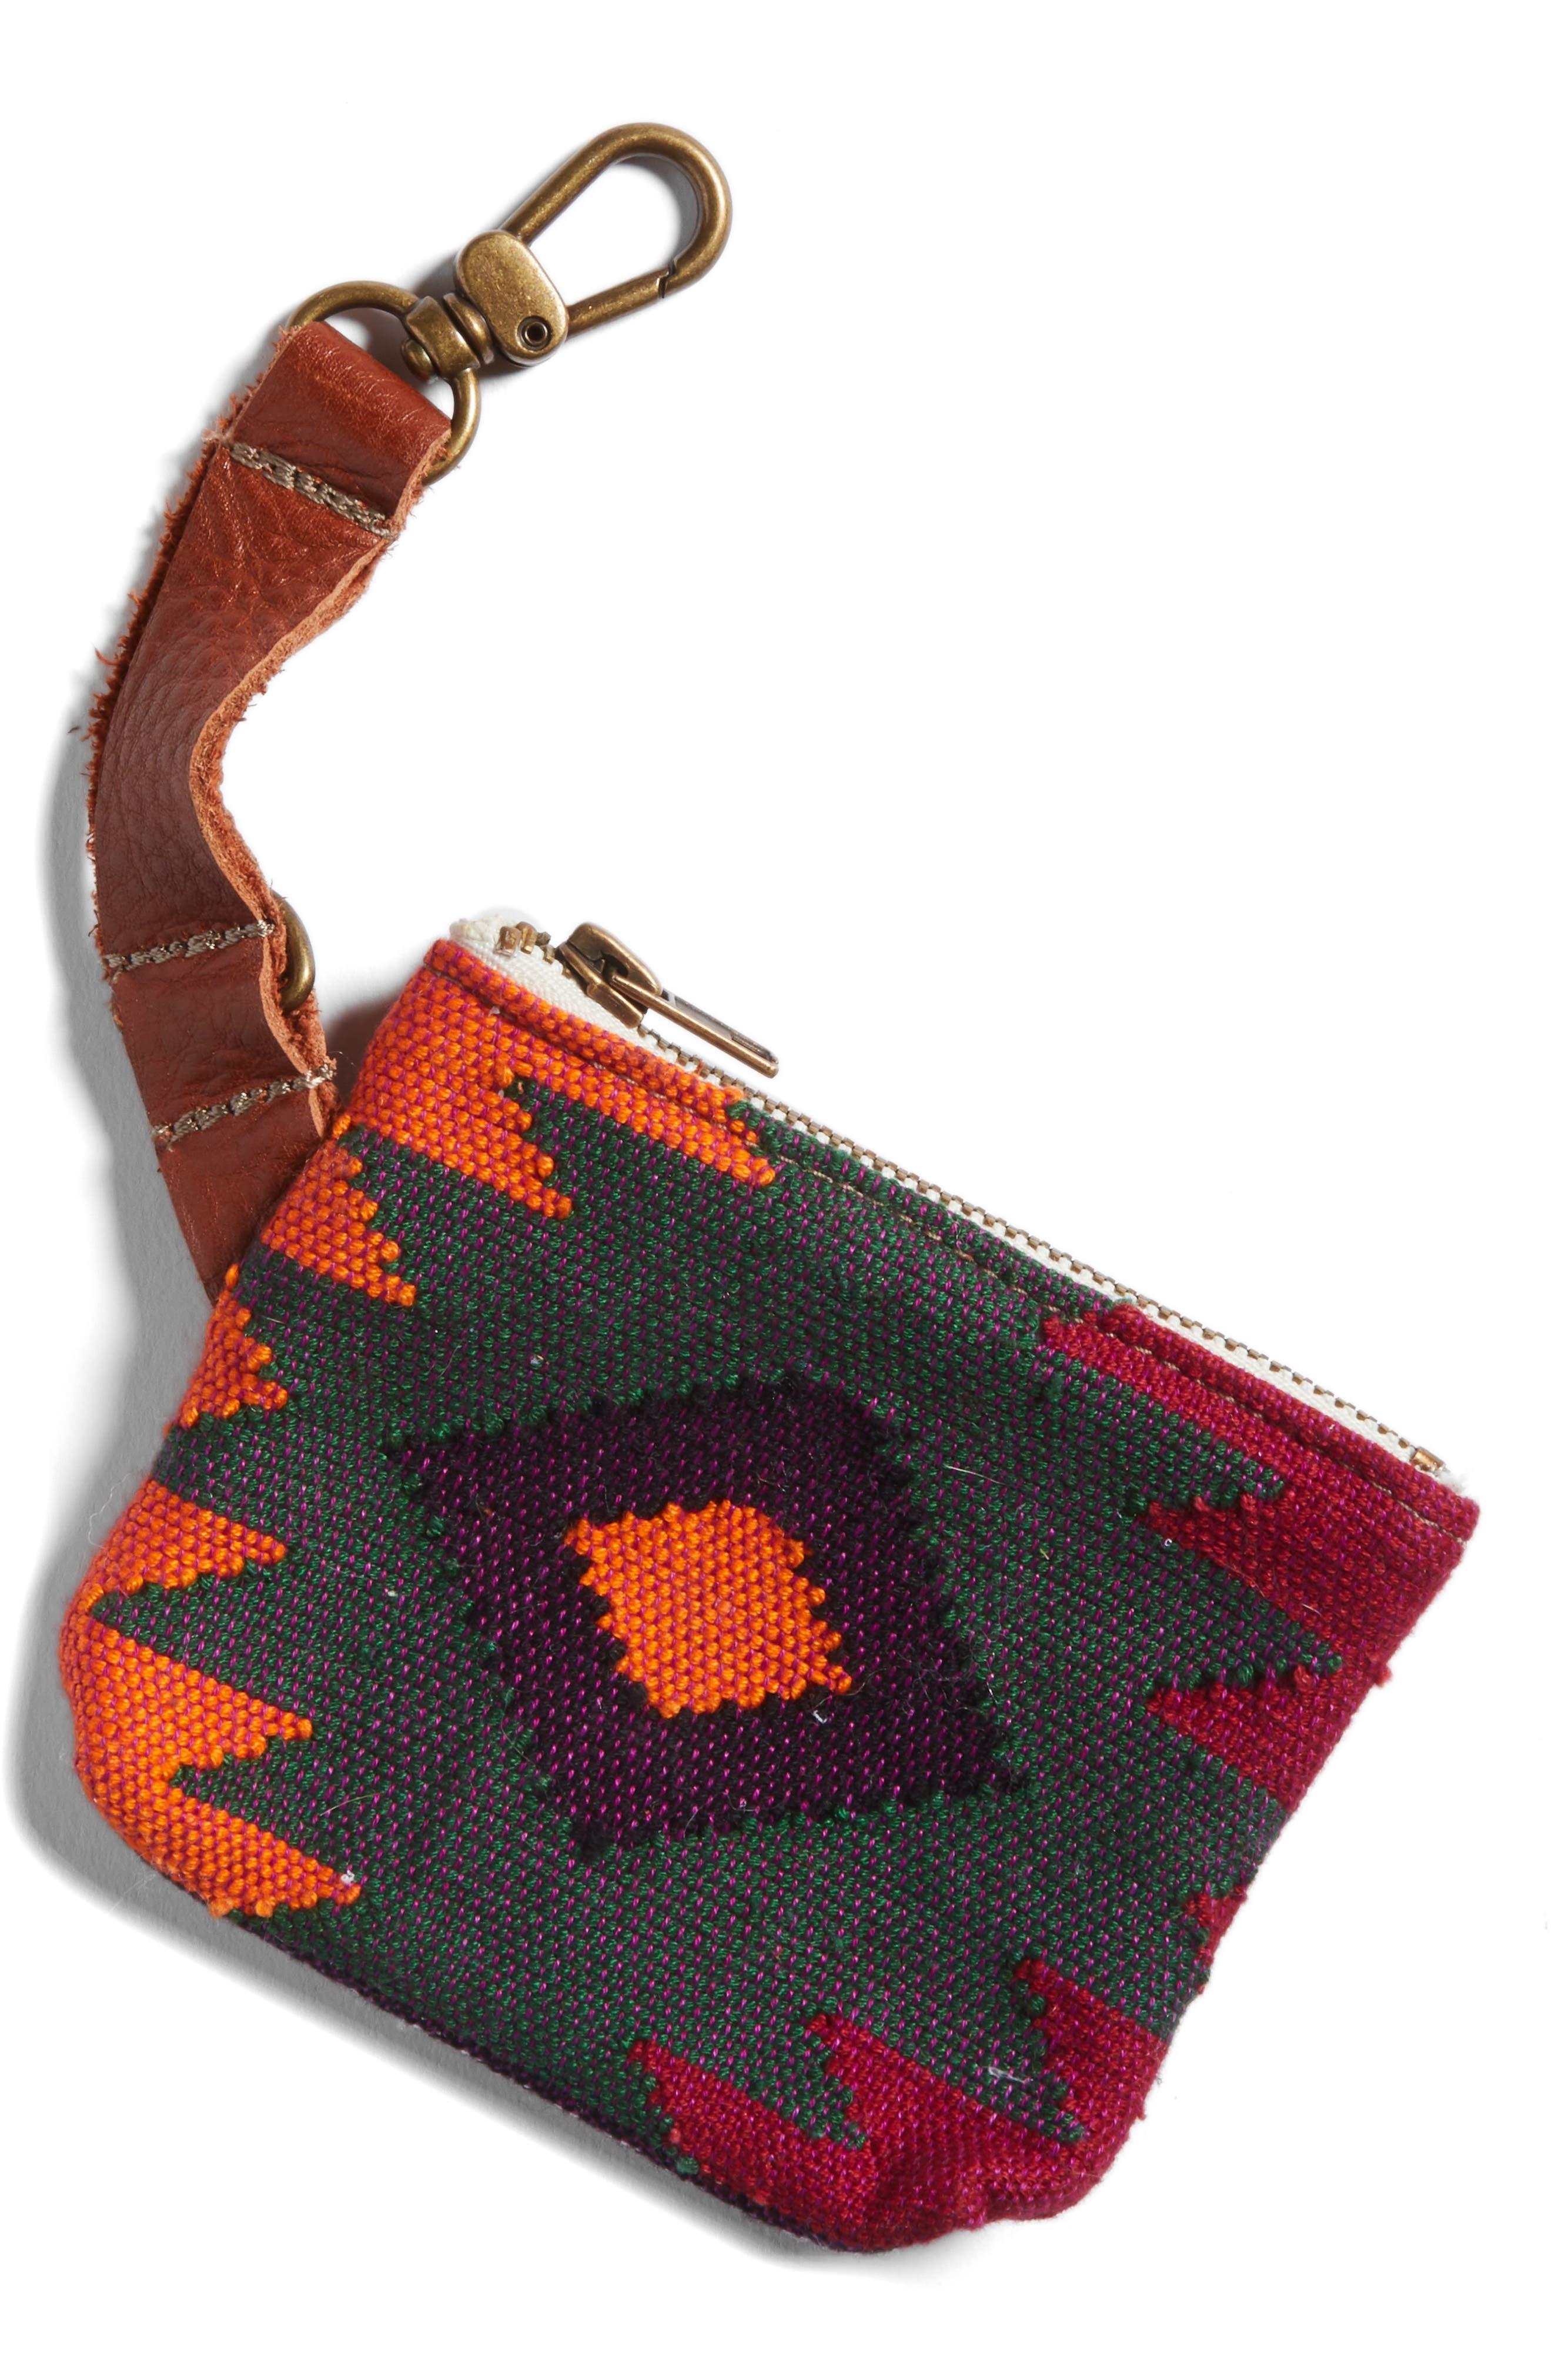 Oaxaca Sunburst Waste Bag Pouch,                         Main,                         color,